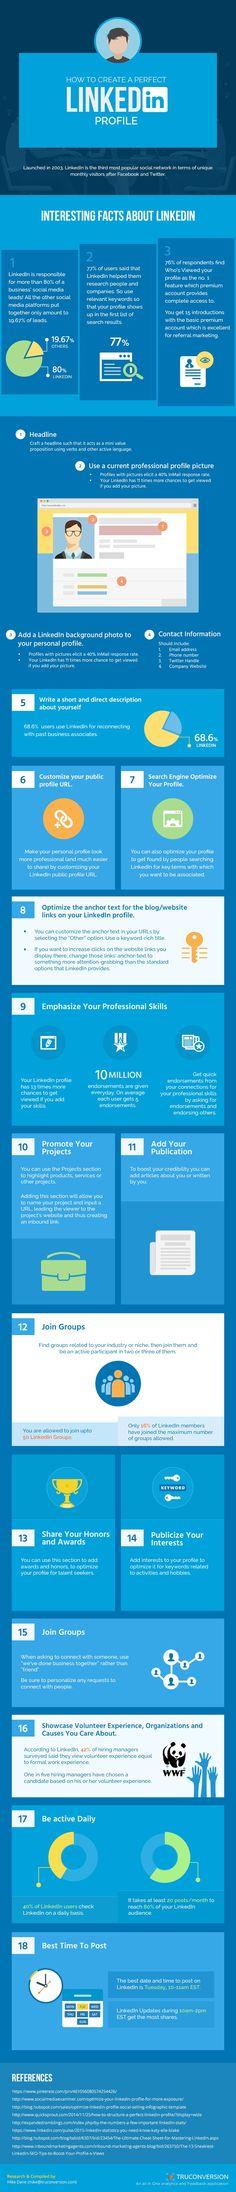 Perfect LinkedIn Profile Infographic